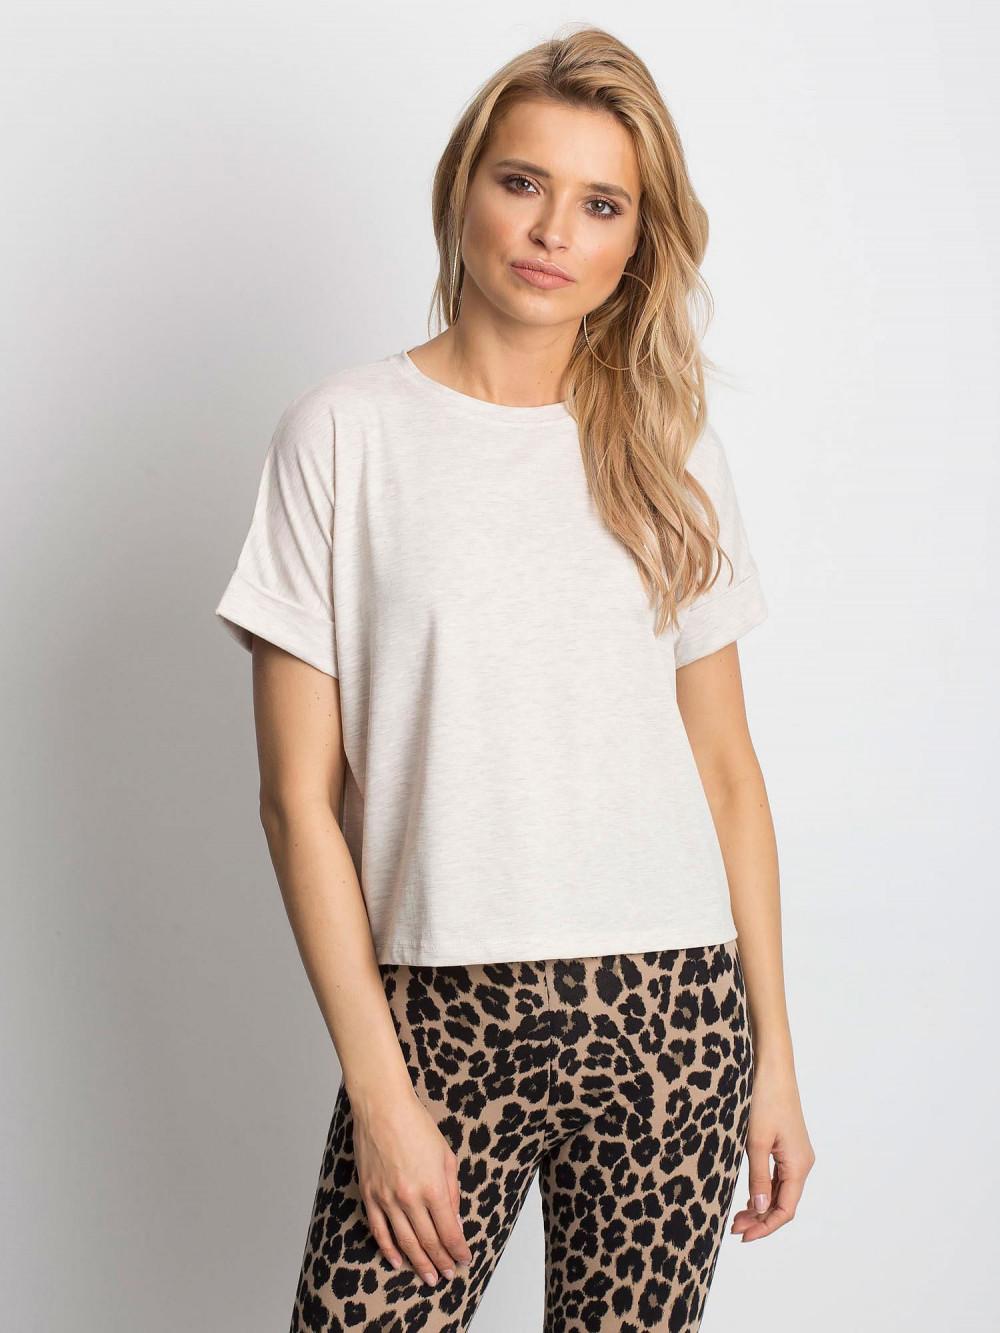 Beżowy melanżowy luźny t-shirt Blink 1